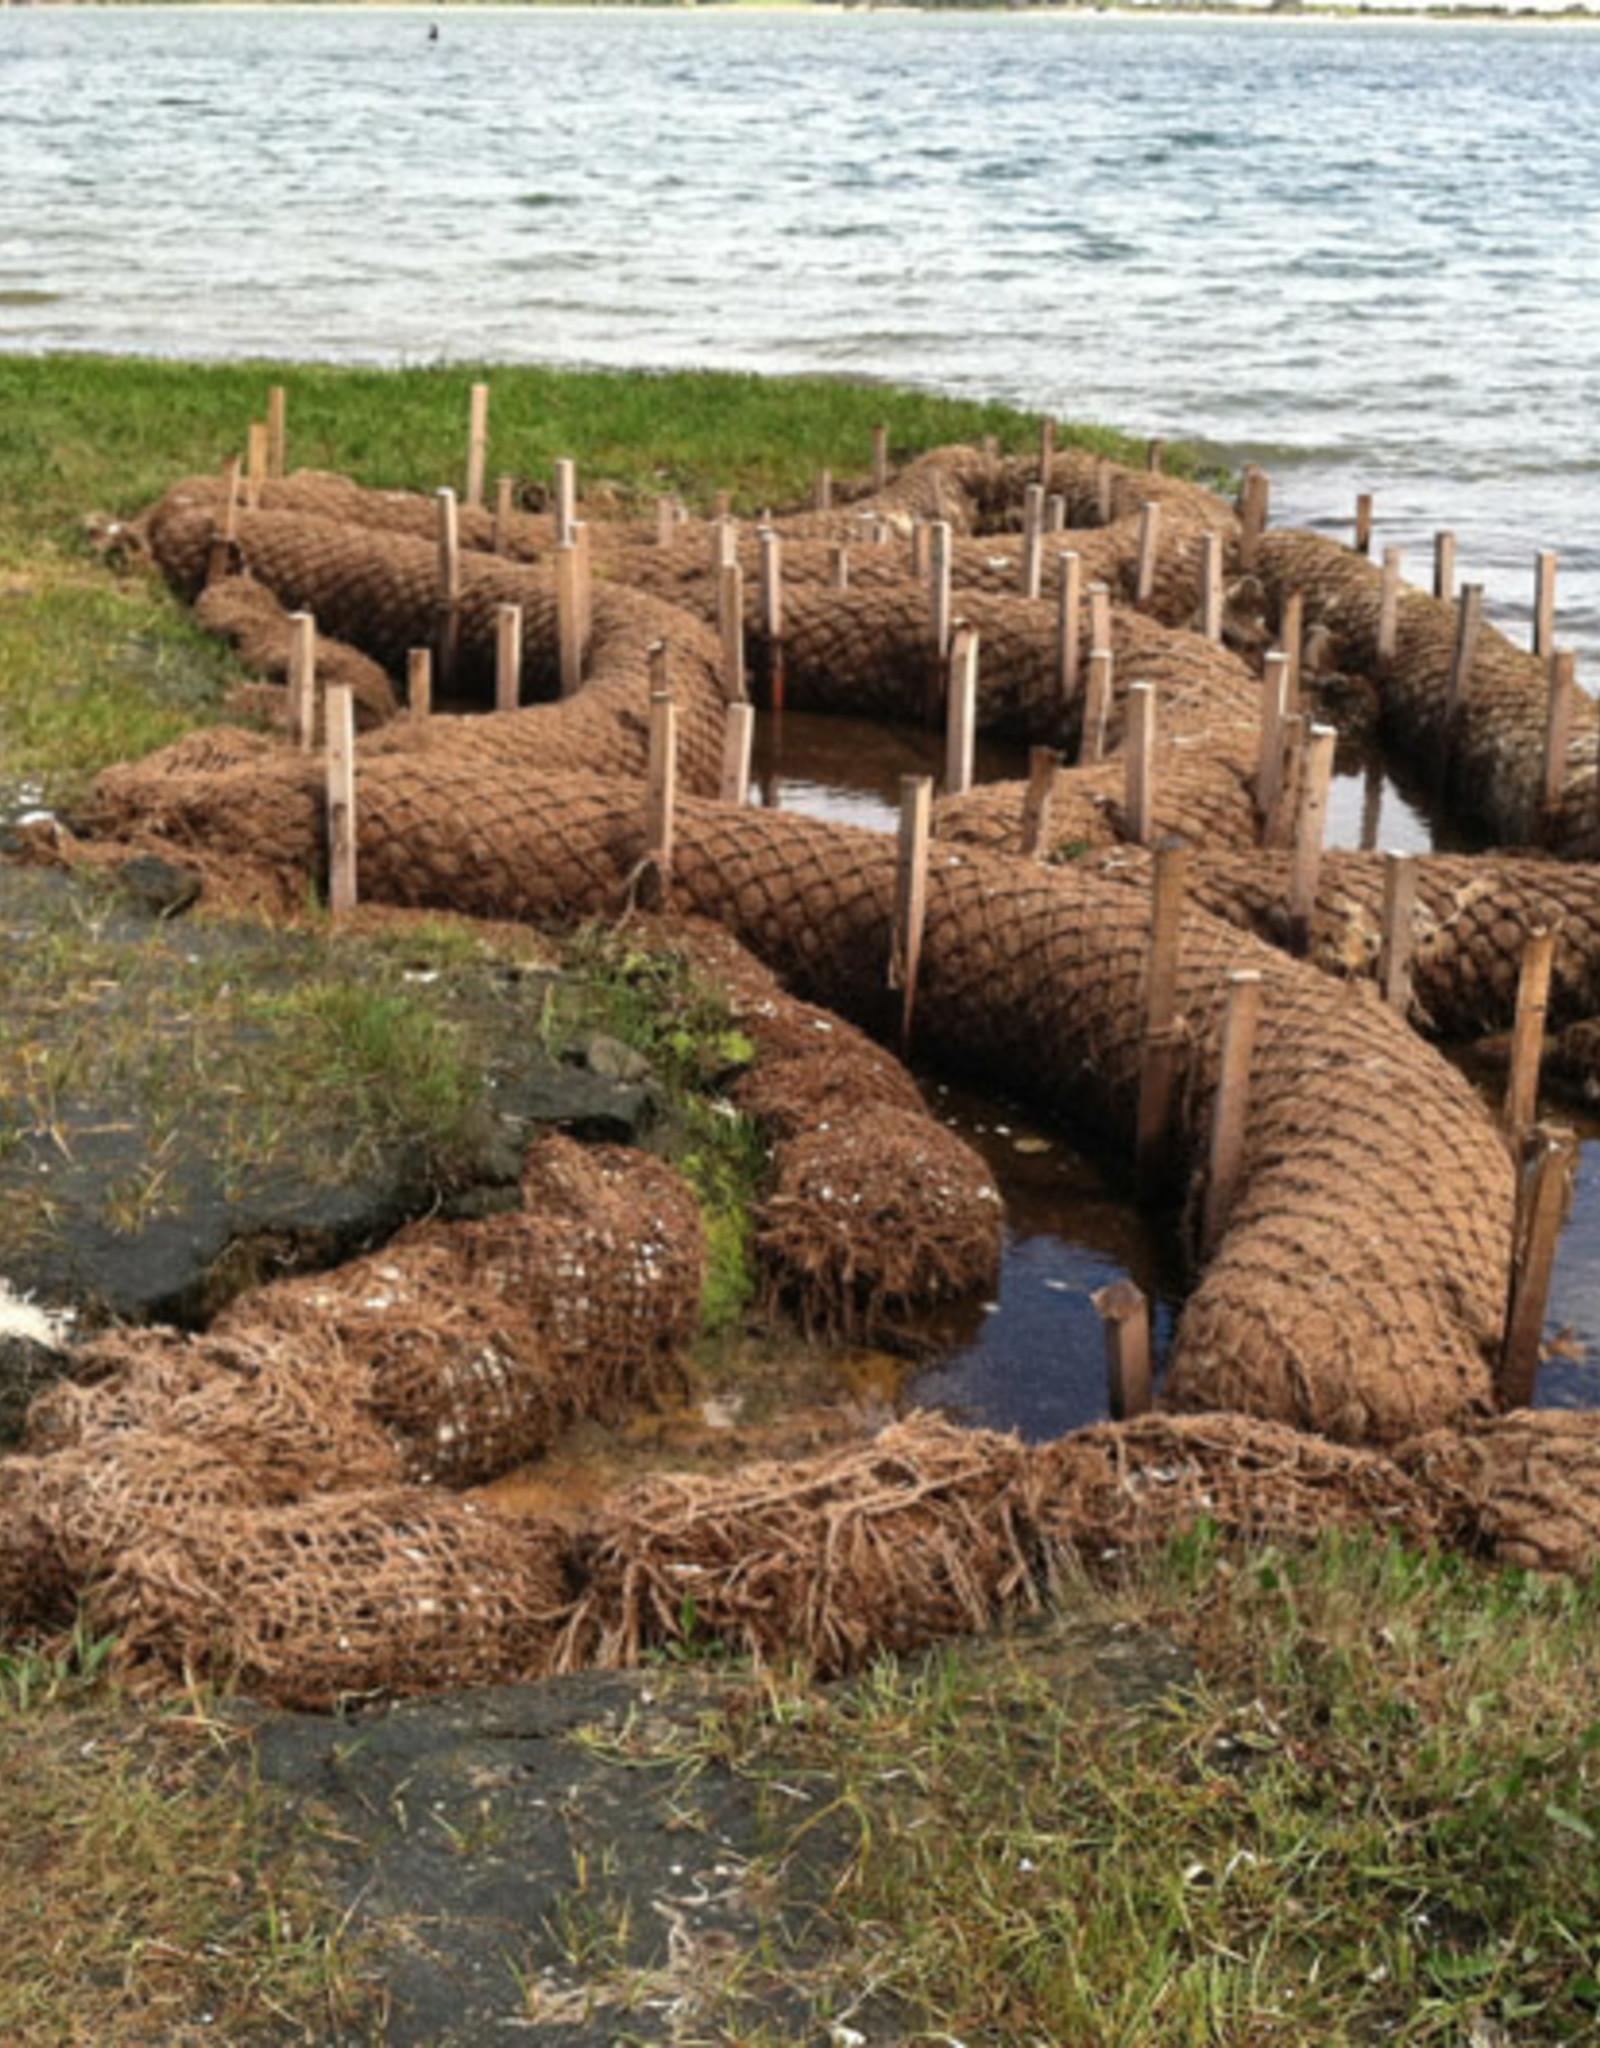 "Coconut Coir Log With Natural Net, SZ. 12"" x 10'"